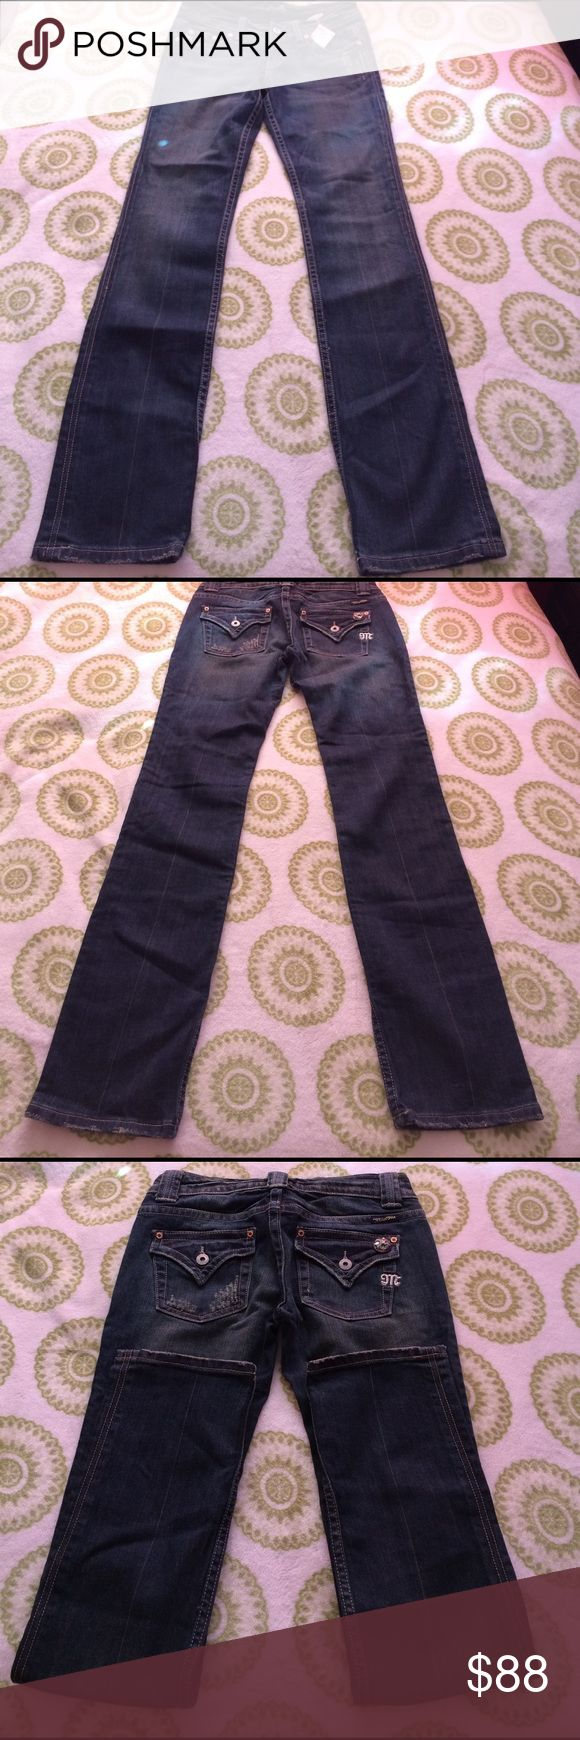 Miss Me Straight Leg JP4332 Kansas Size 28/32.NWT Miss Me Straight Leg JP4332 Kansas Size 28 (32 Inseam) Women's Jeans 👖NWT Miss Me Jeans Straight Leg